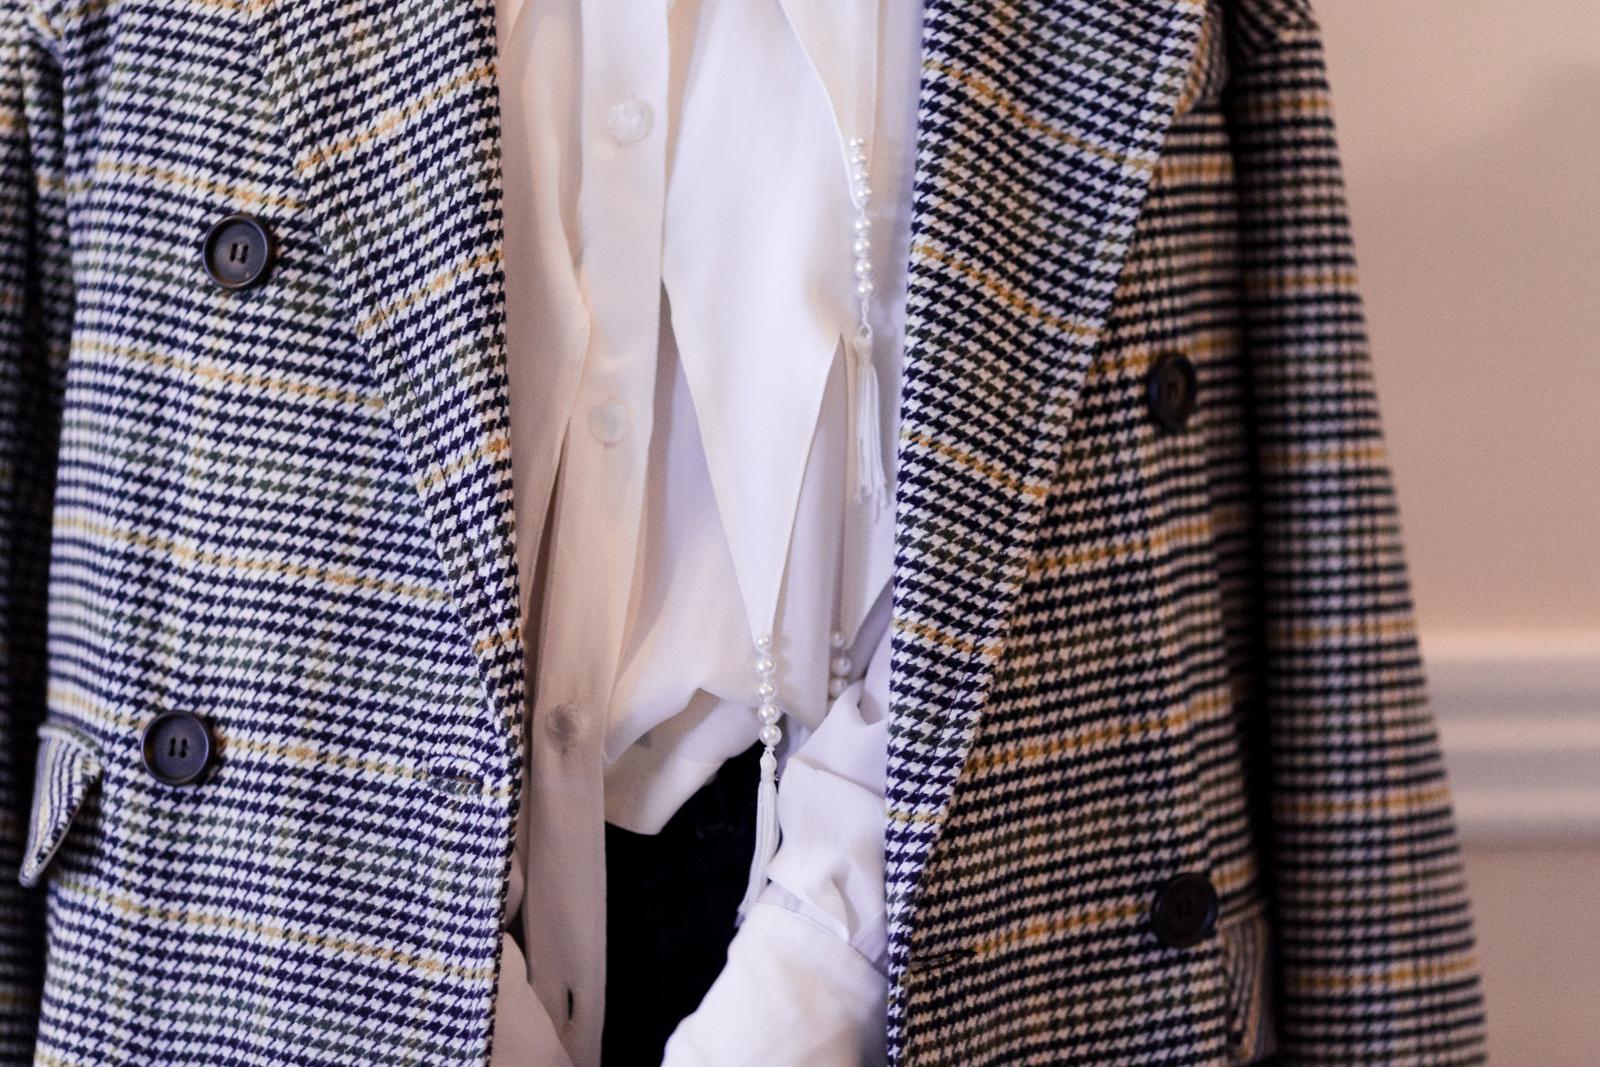 Eldridge Edit_anna_e_cottrell_fashion_blog_blogger_nordstrom_topshop_houndstooth_double_breasted_duster_coat_sale_topshop_garret_leight_glasses_thatch_lola_14k_gold_hoops_vintage_zara_bug_bag_mgb_photo_17.jpg